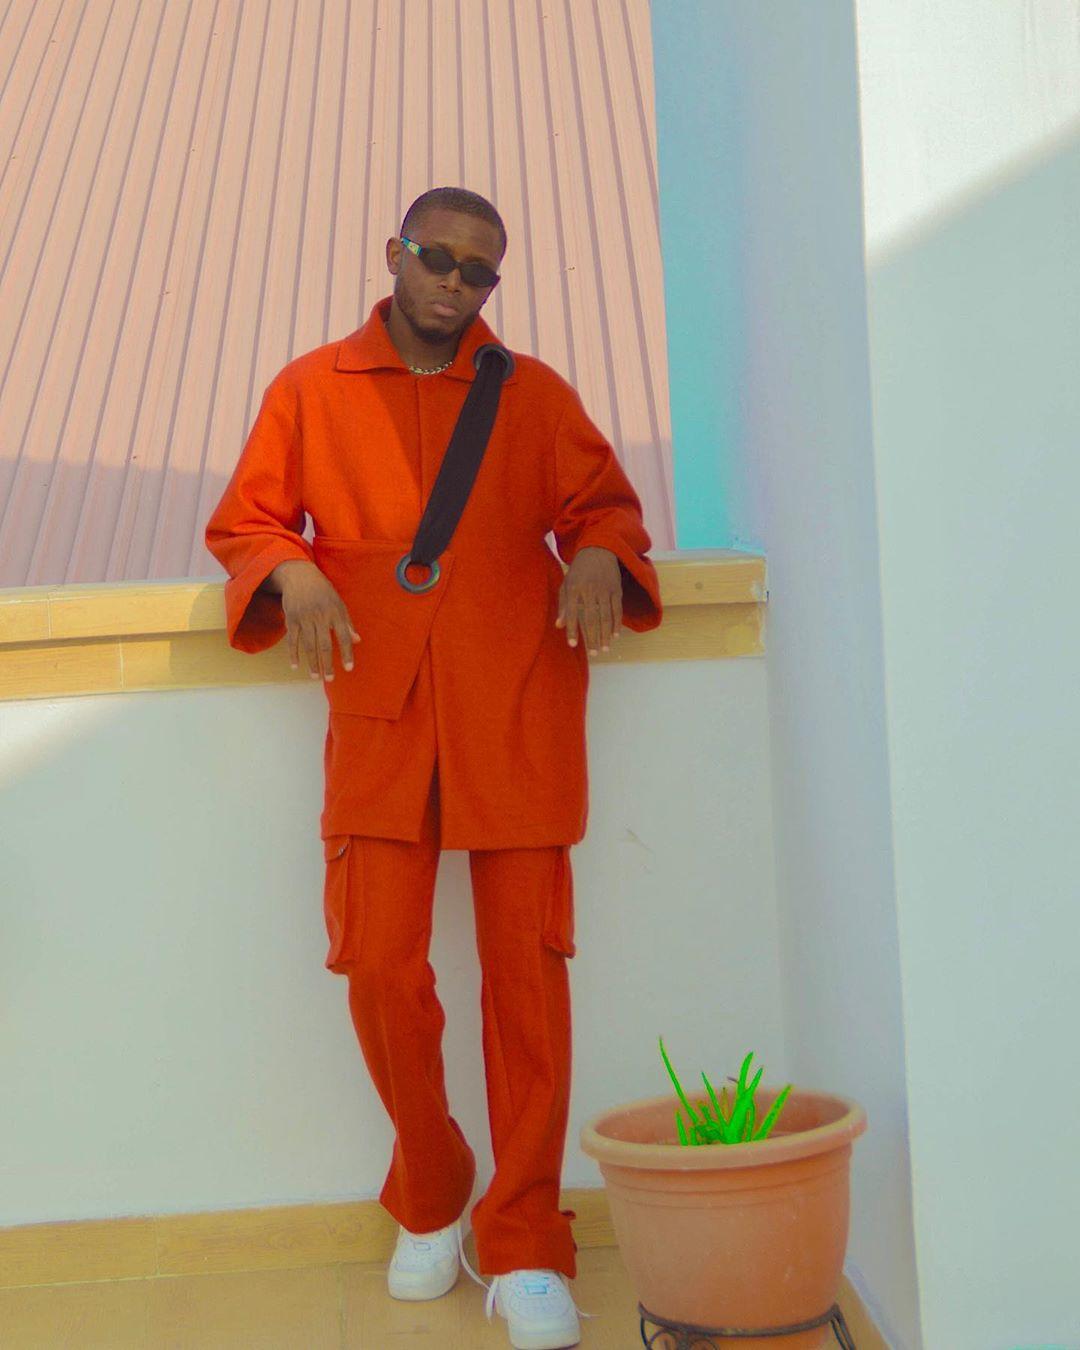 style-inspiration-africa-nigeria-hottest-fashion-style-rave